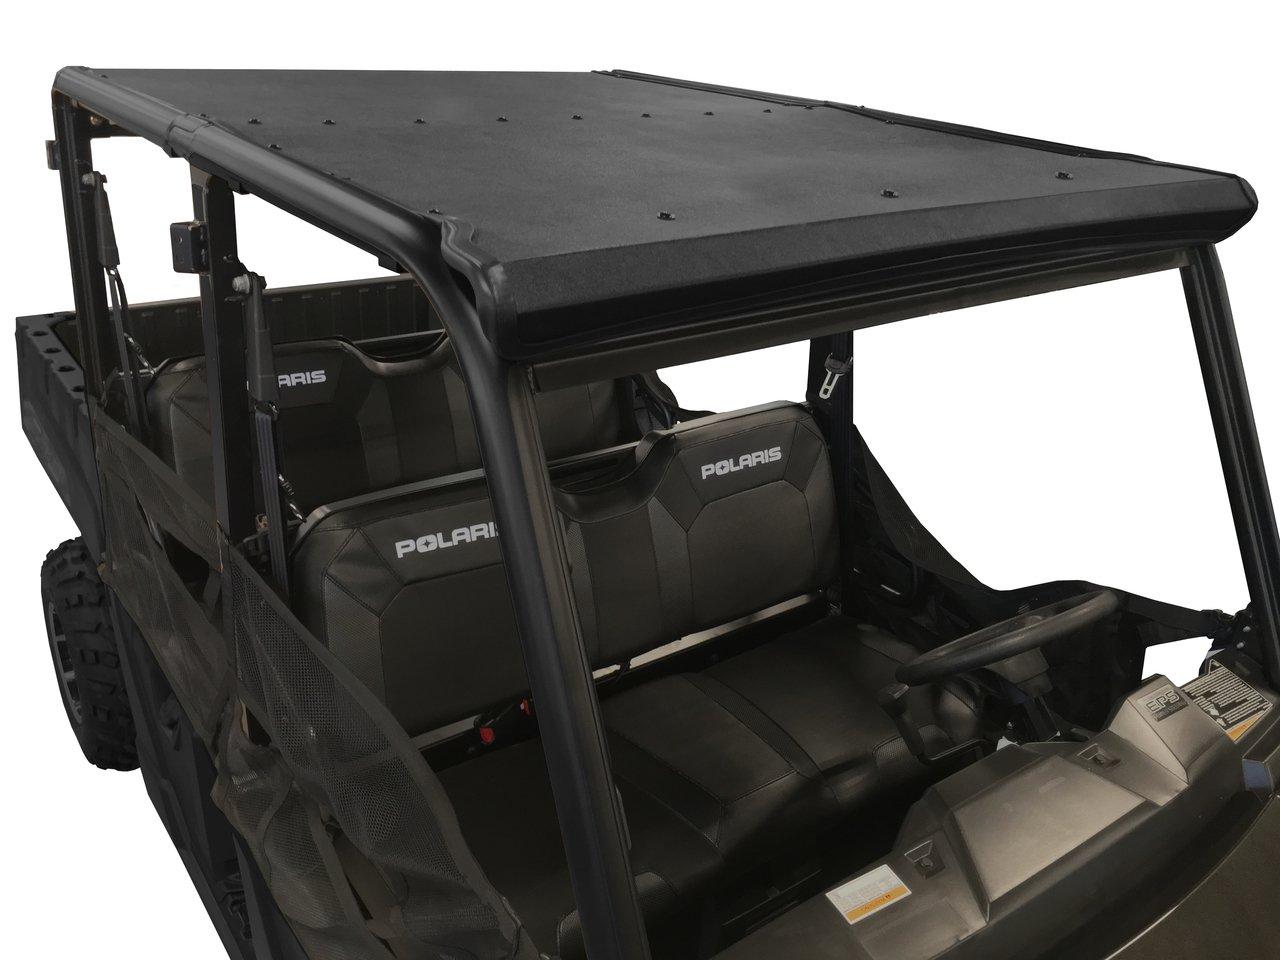 Polaris Ranger mid-sizeクルー4 Seat 2015 +ハード屋根 B01MRCAT9B